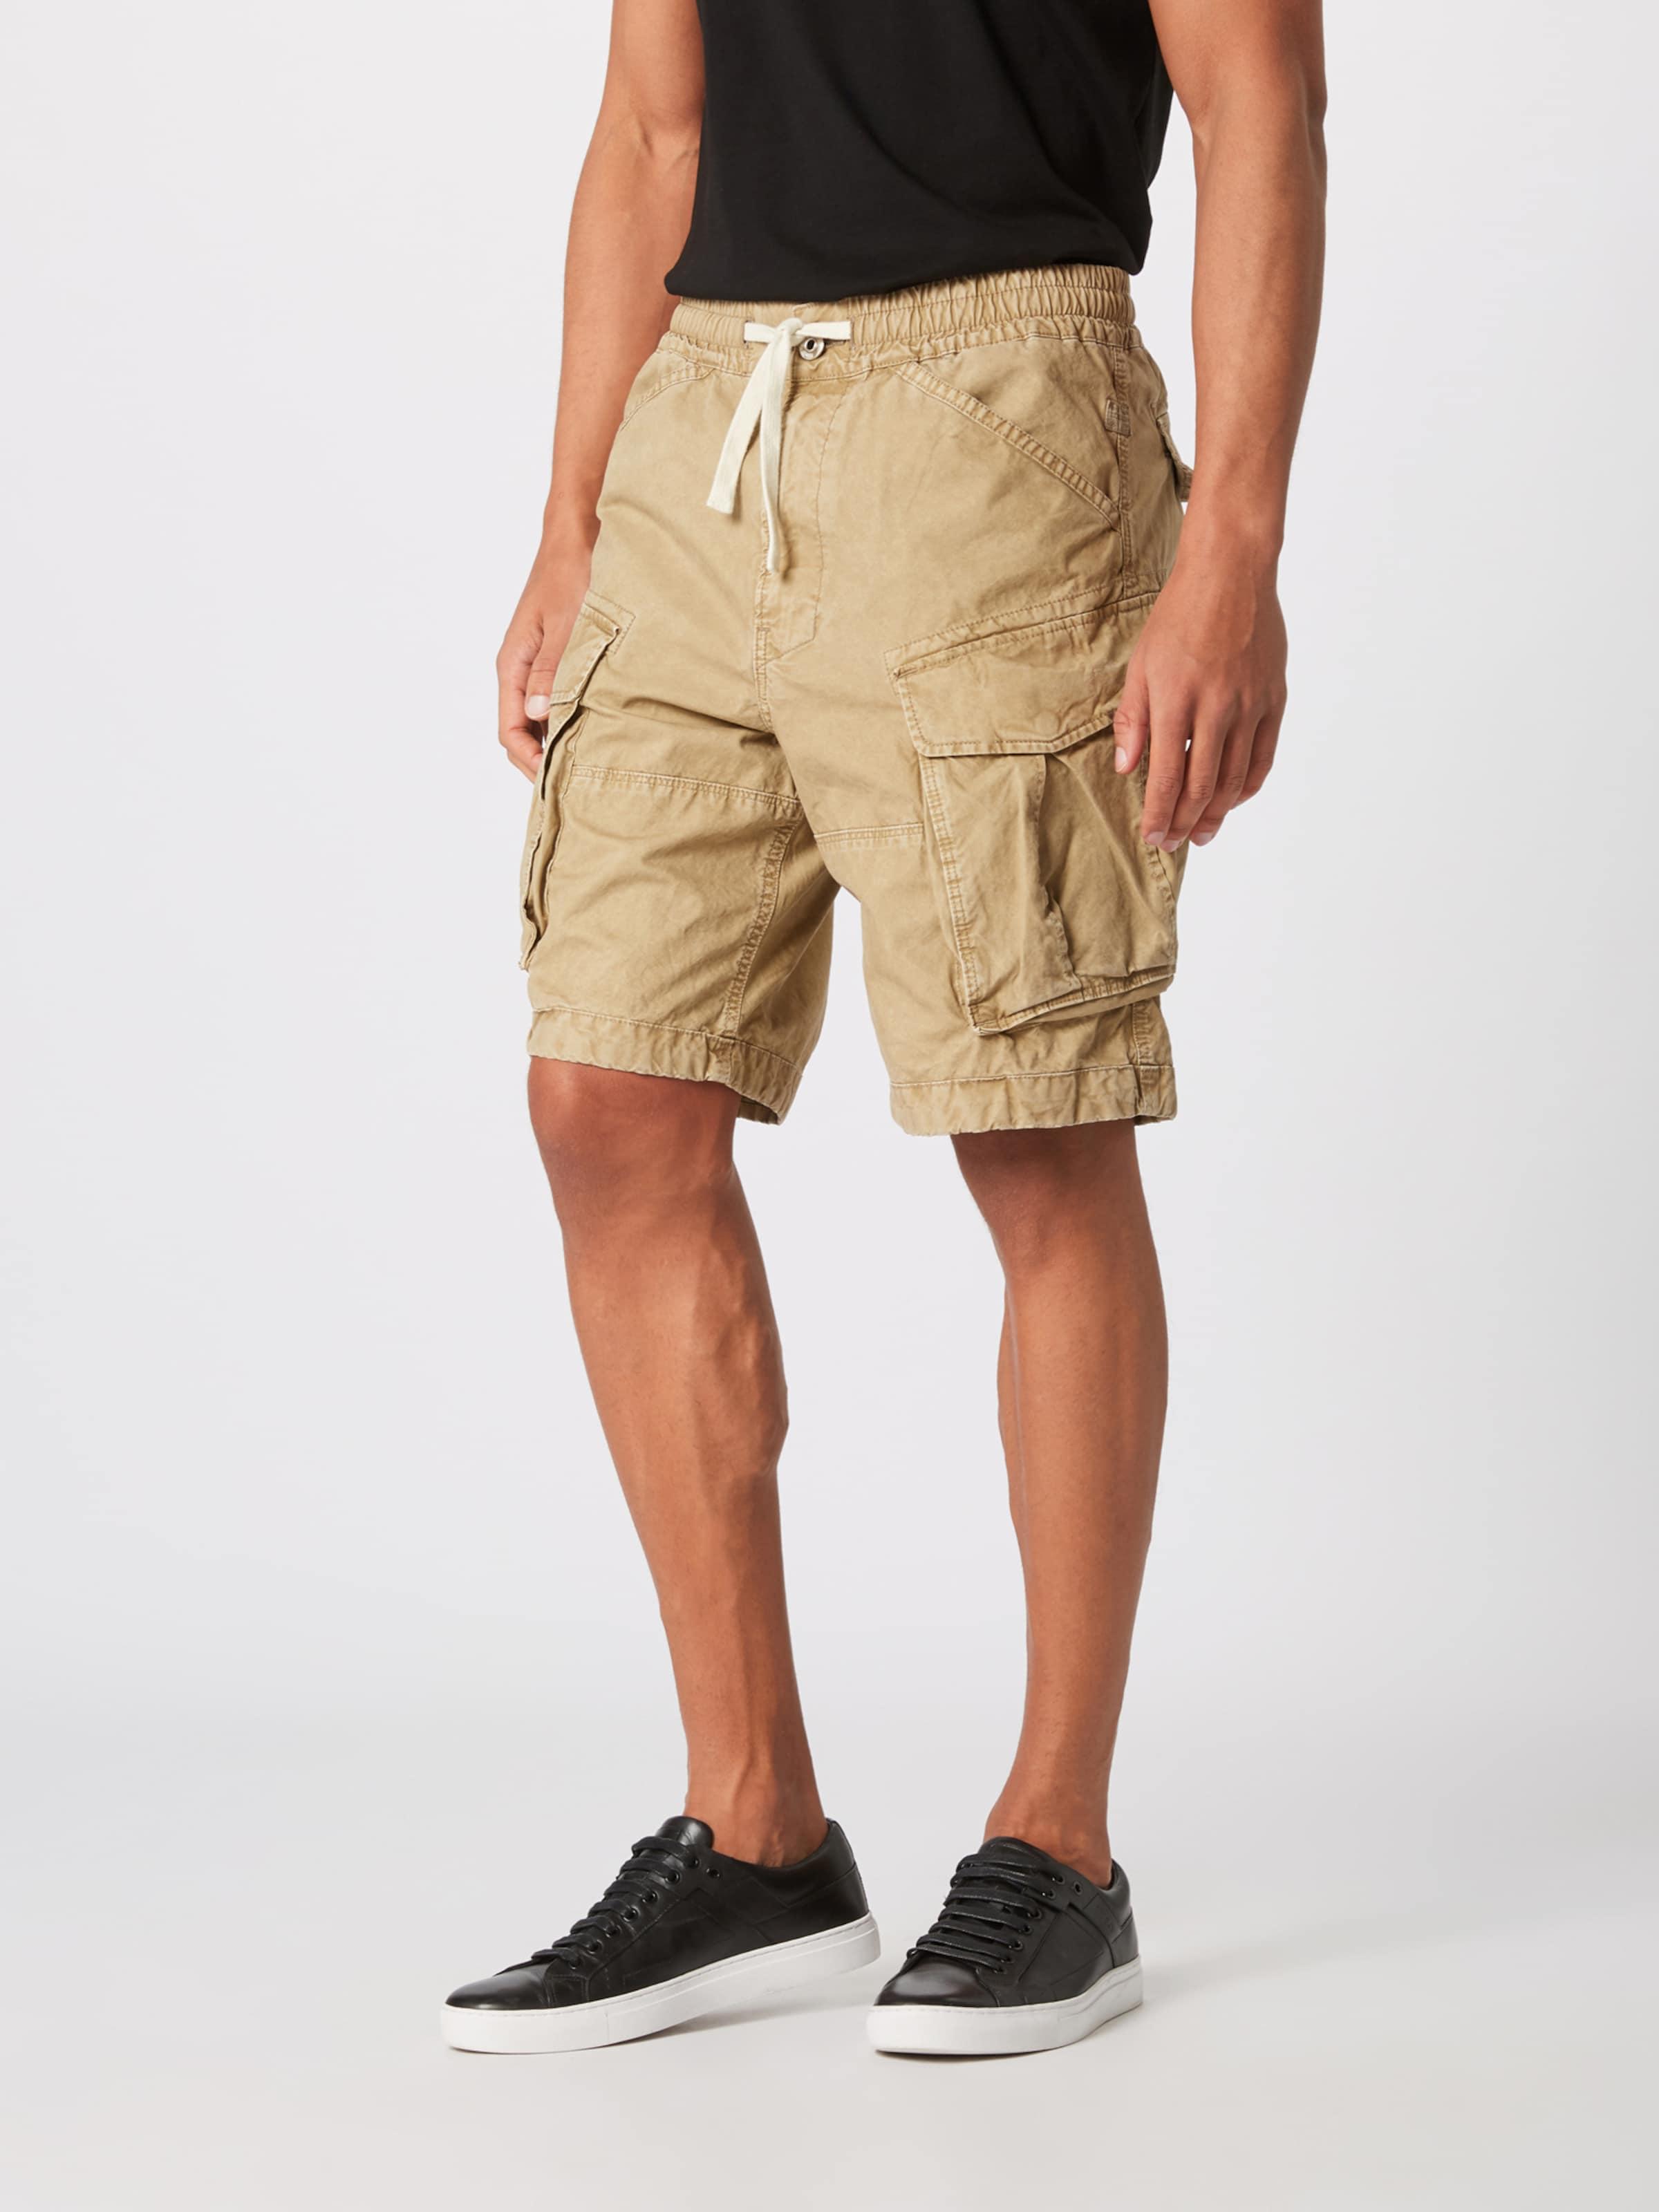 star Raw G 'rovic' Shorts In Beige 0OkwPnX8